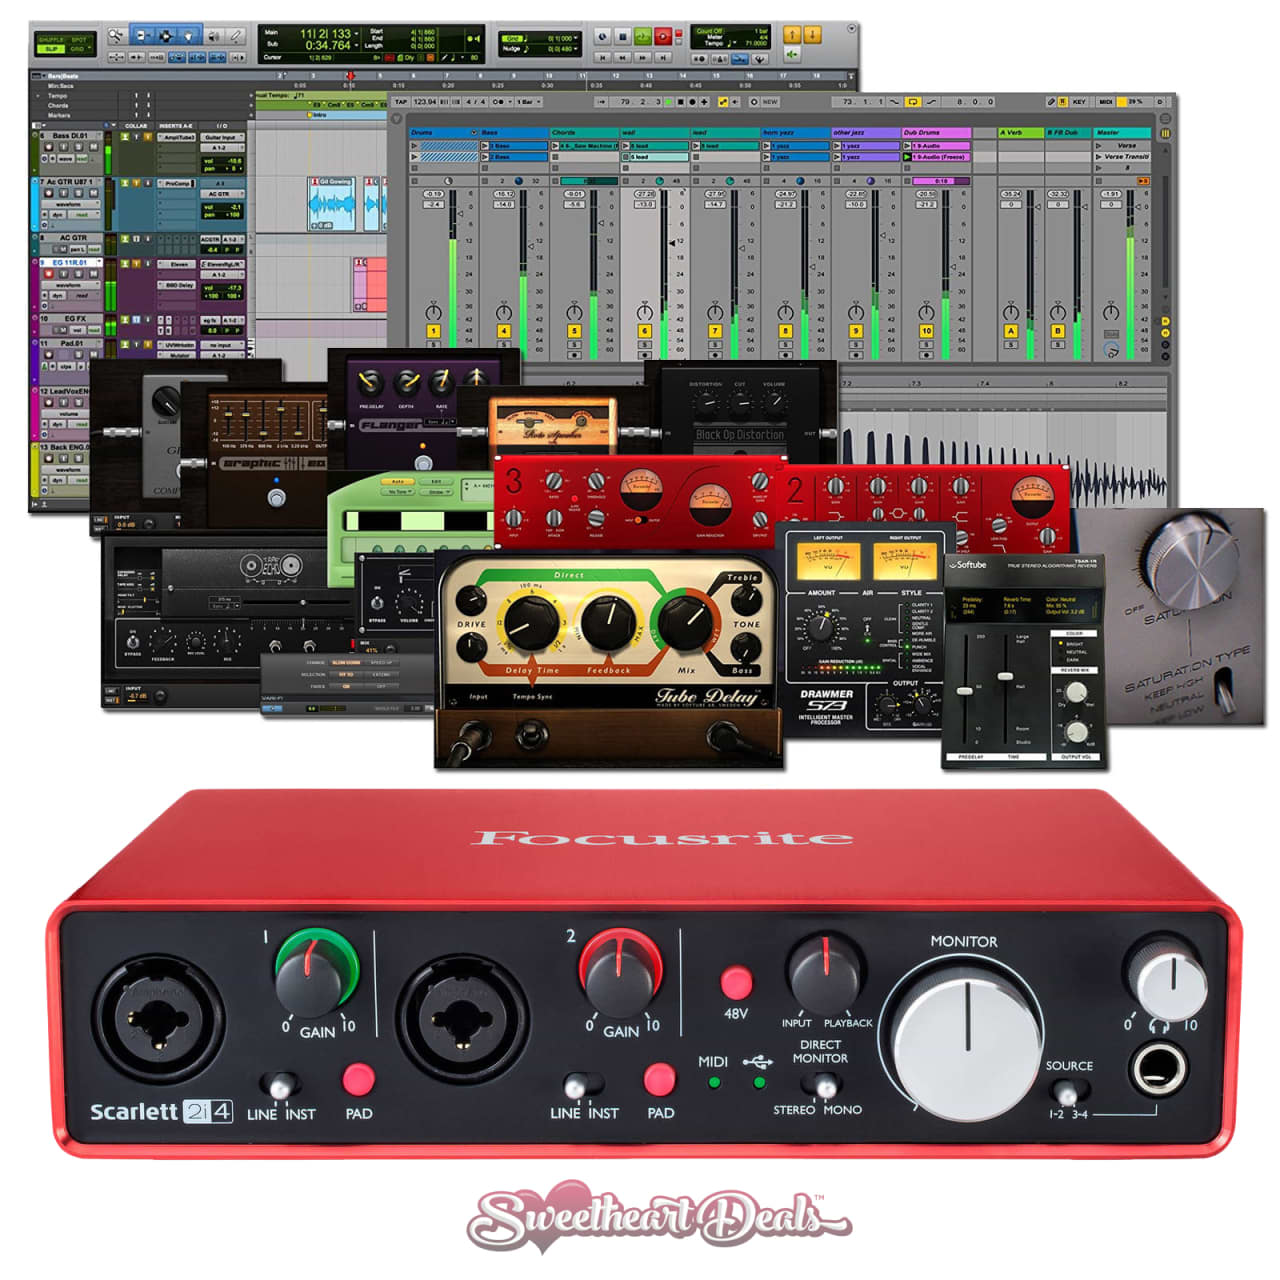 focusrite scarlett 2i4 2nd gen usb audio interface with pro reverb. Black Bedroom Furniture Sets. Home Design Ideas